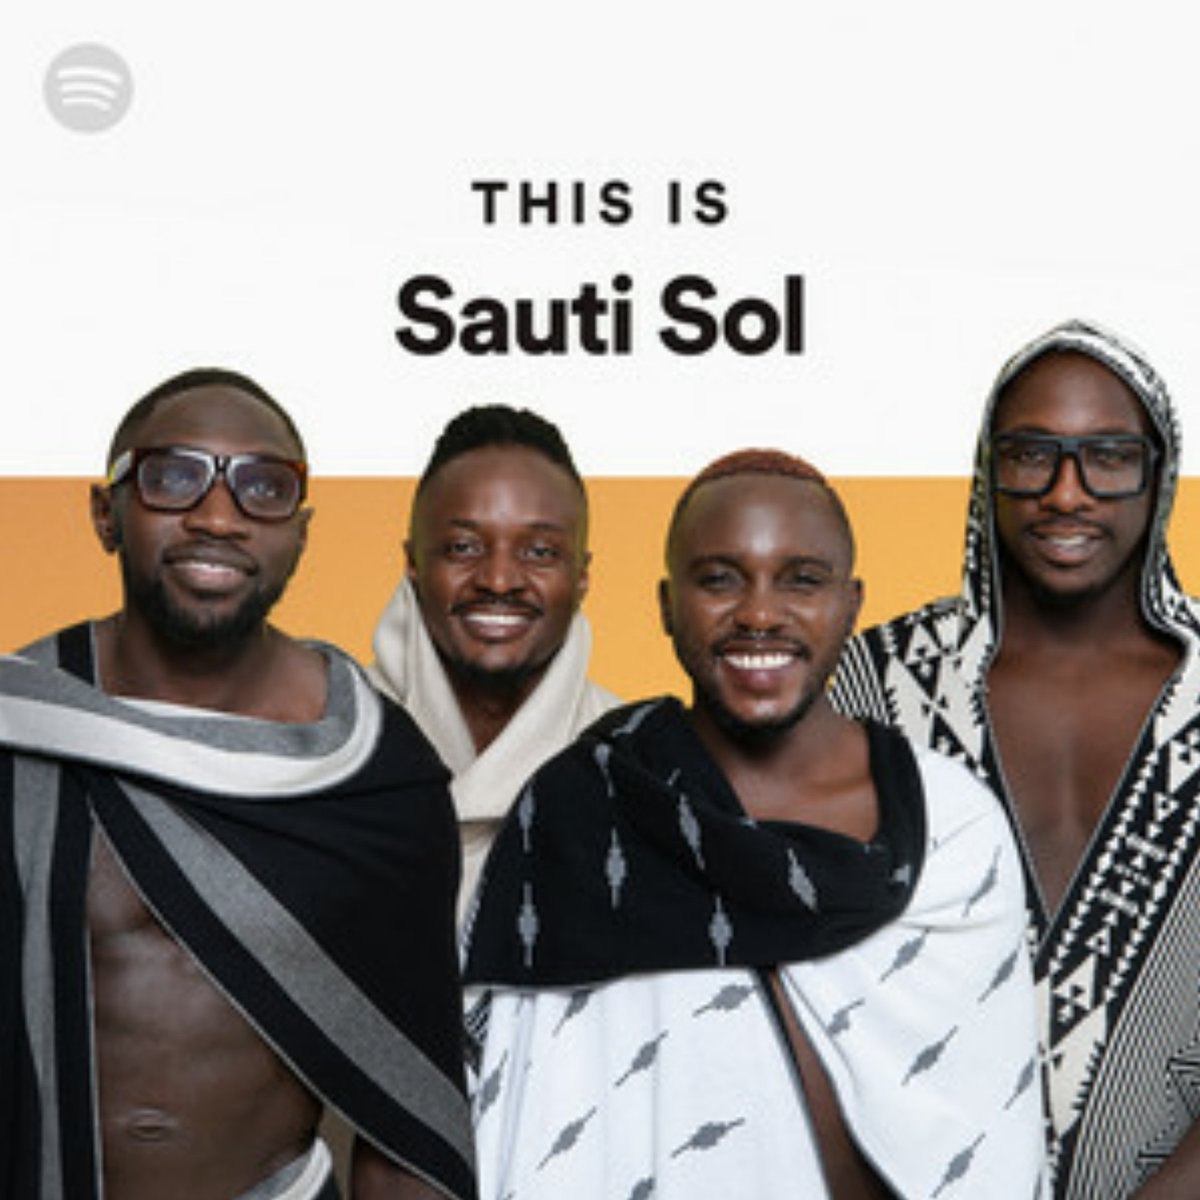 THIS IS SAUTI SOL playlist by @Spotify @SpotifySA Stream now: spoti.fi/2SZEHQC